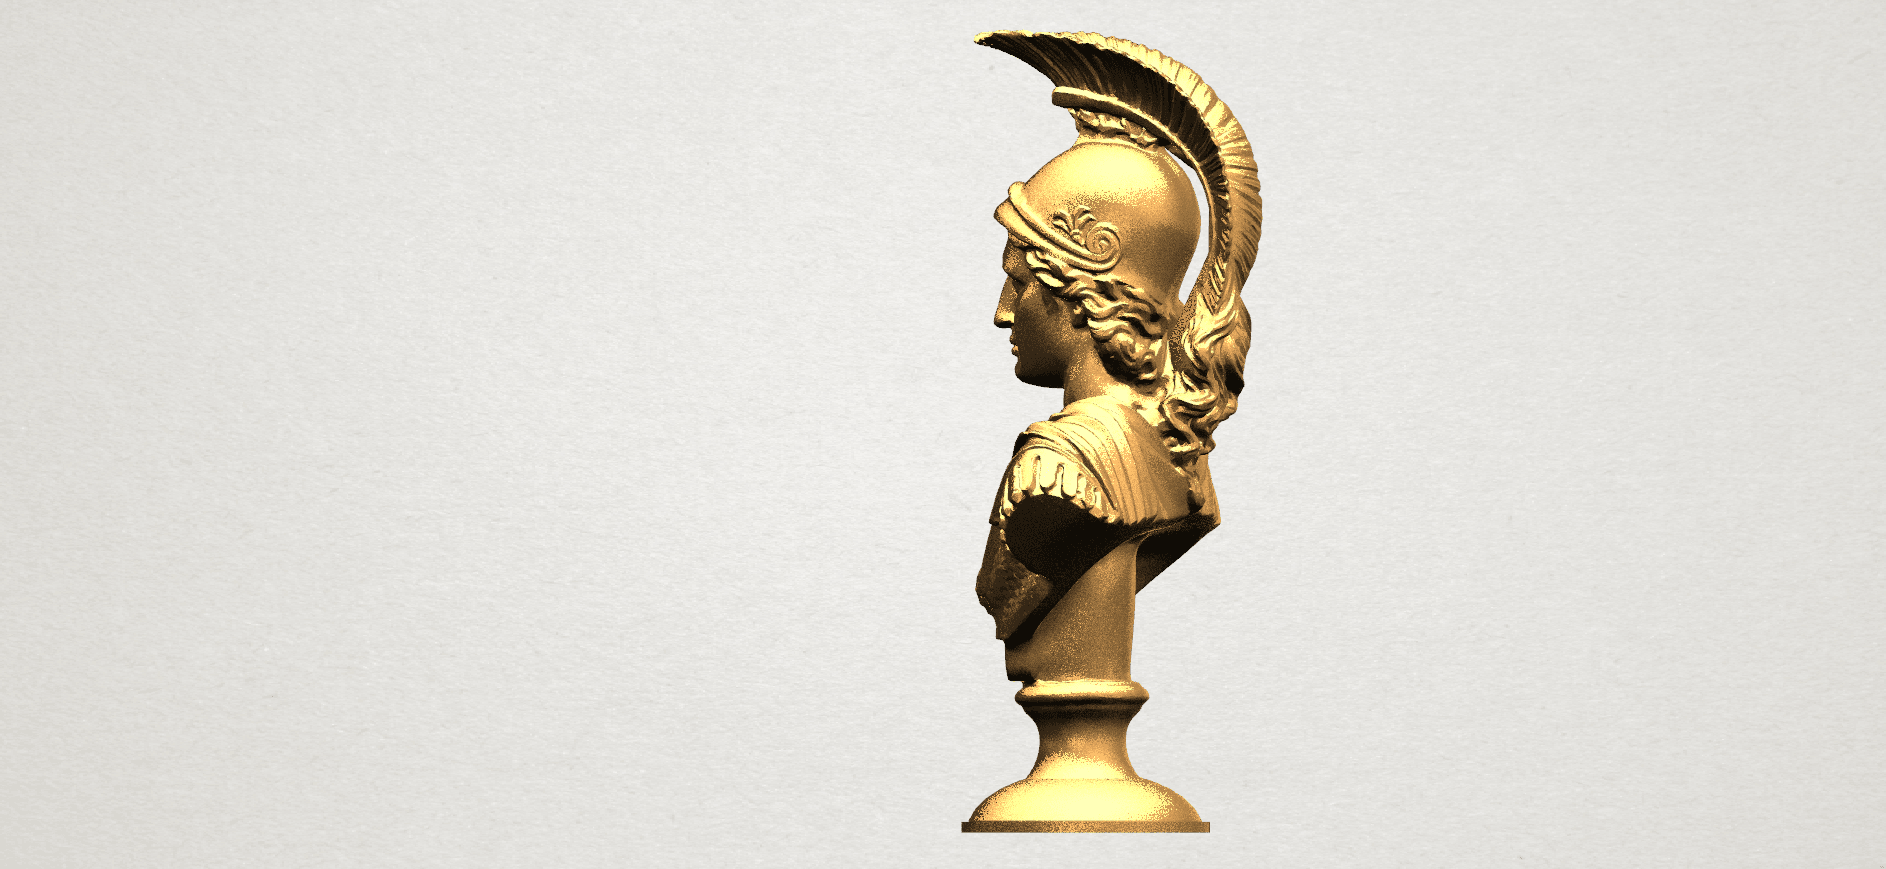 Alexander A05.png Download free STL file Alexander • 3D printer object, GeorgesNikkei